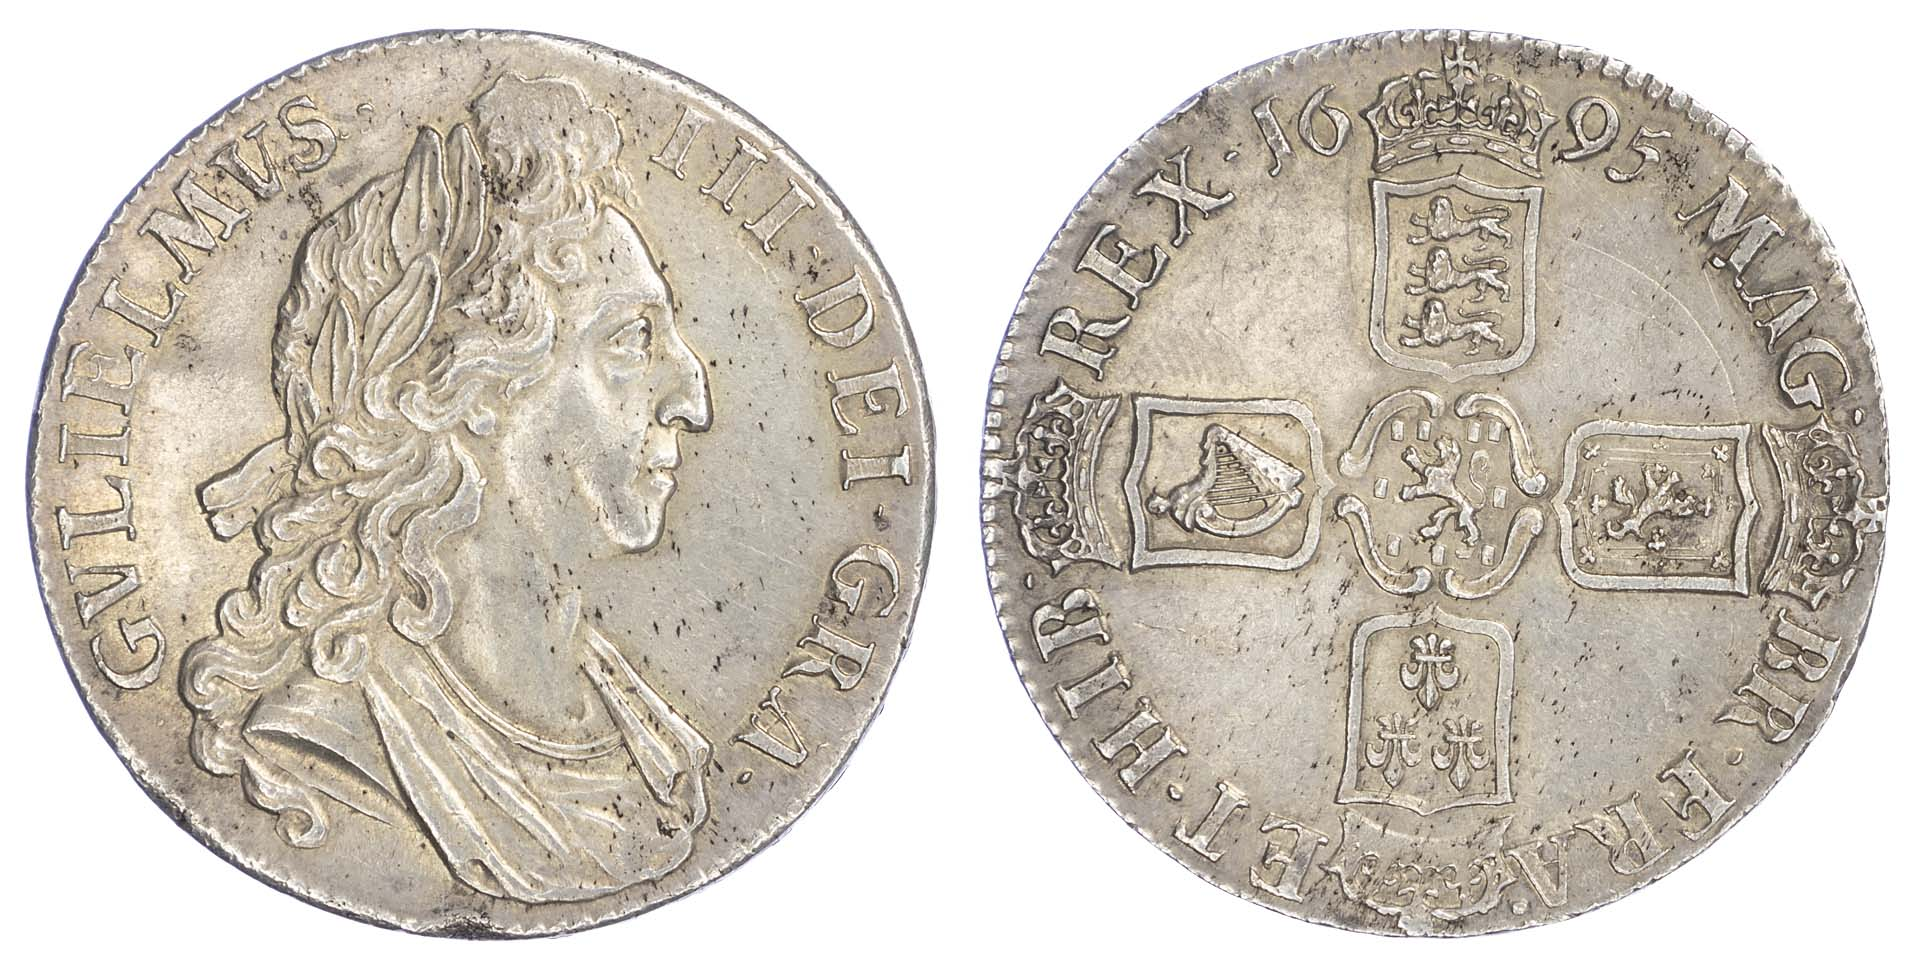 William III (1694-1702), Crown, 1695, Octavo